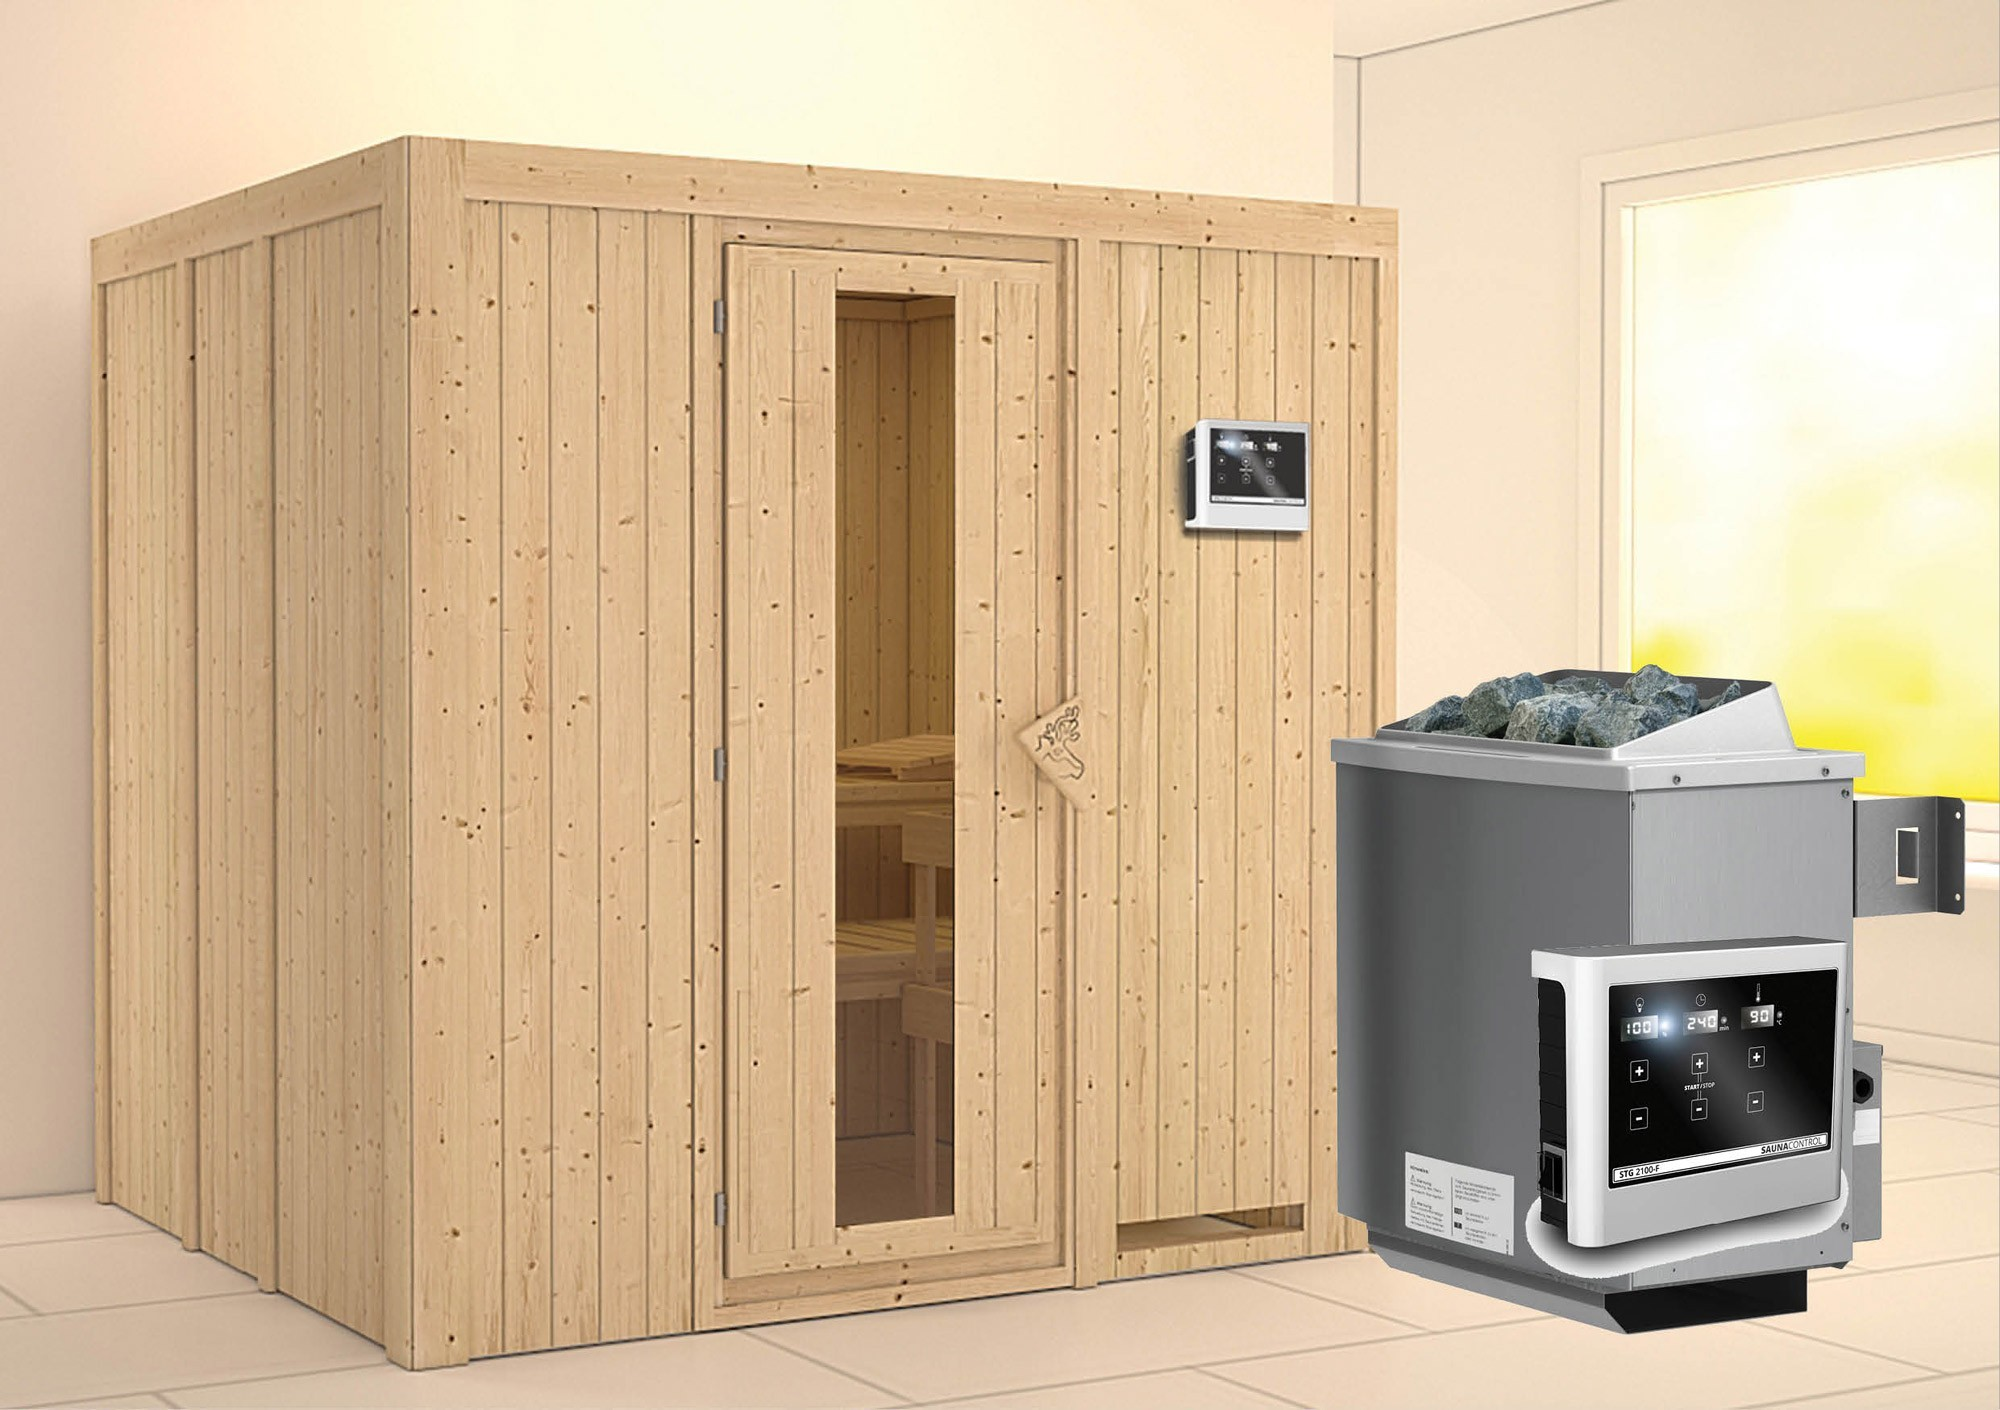 Karibu Sauna Sodin 68mm mit Ofen 9kW extern Holztür Bild 1